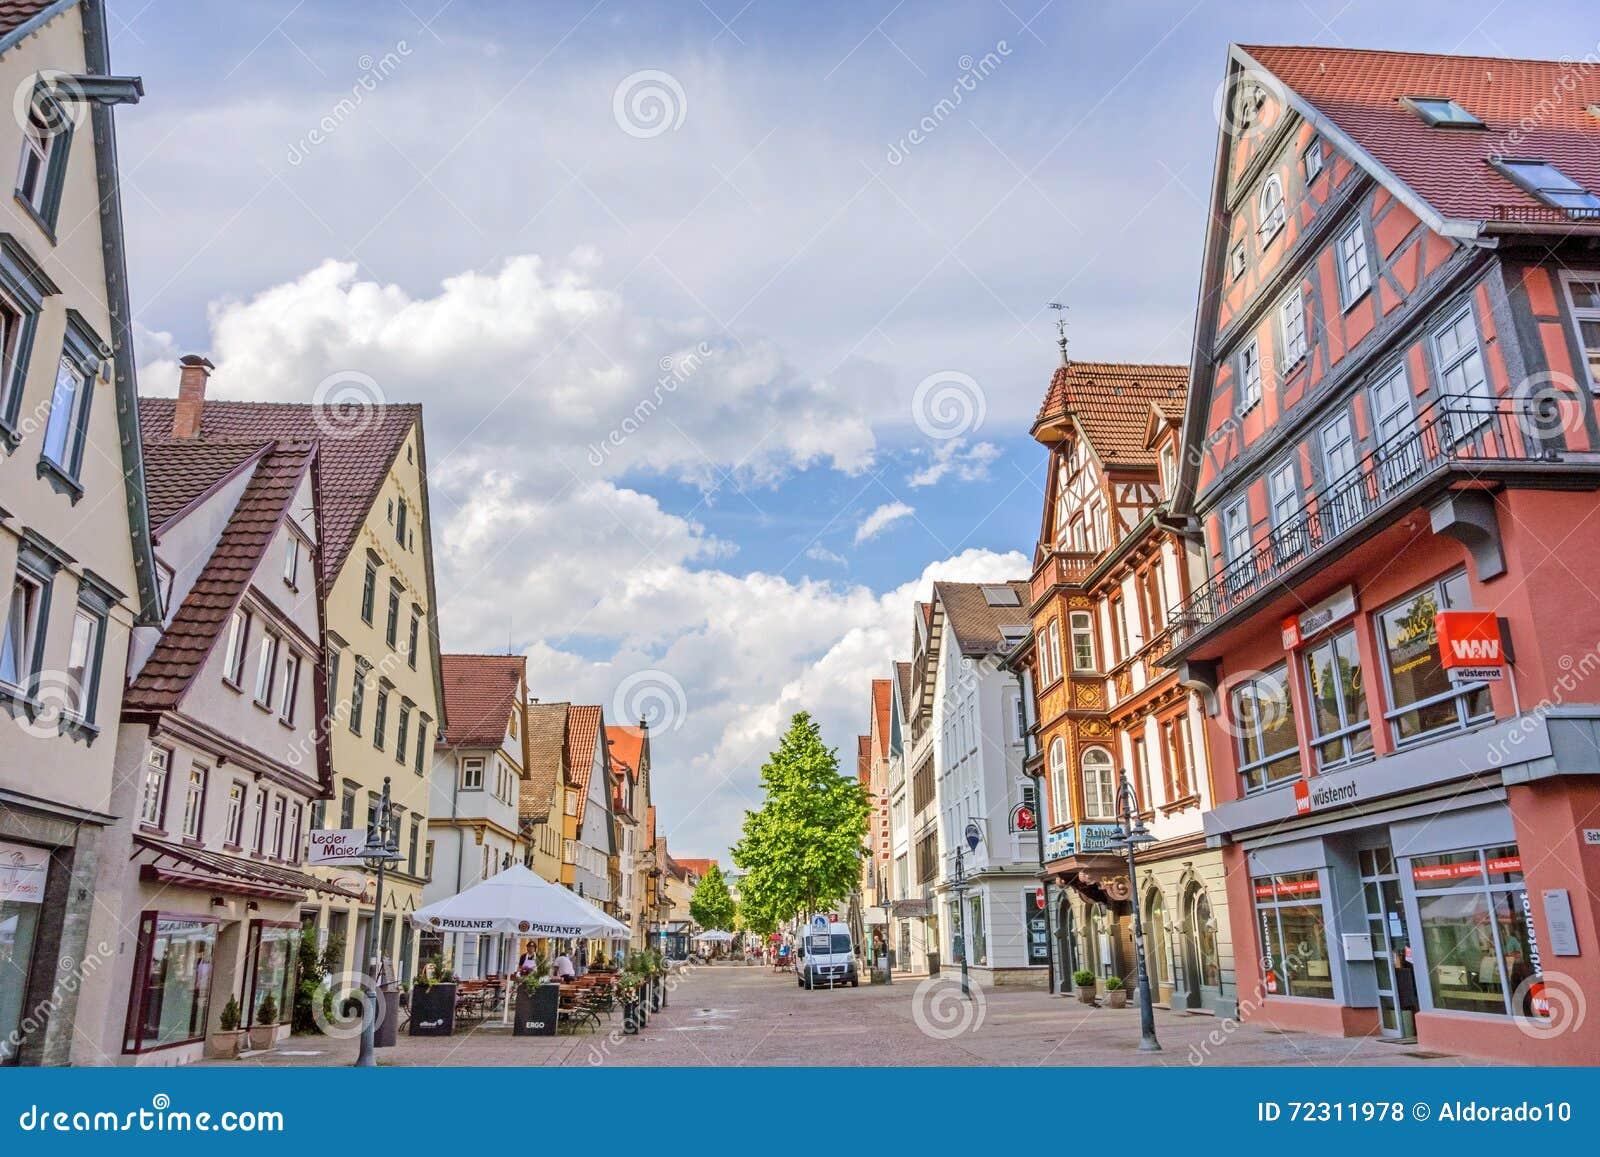 single in heidenheim an der brenz